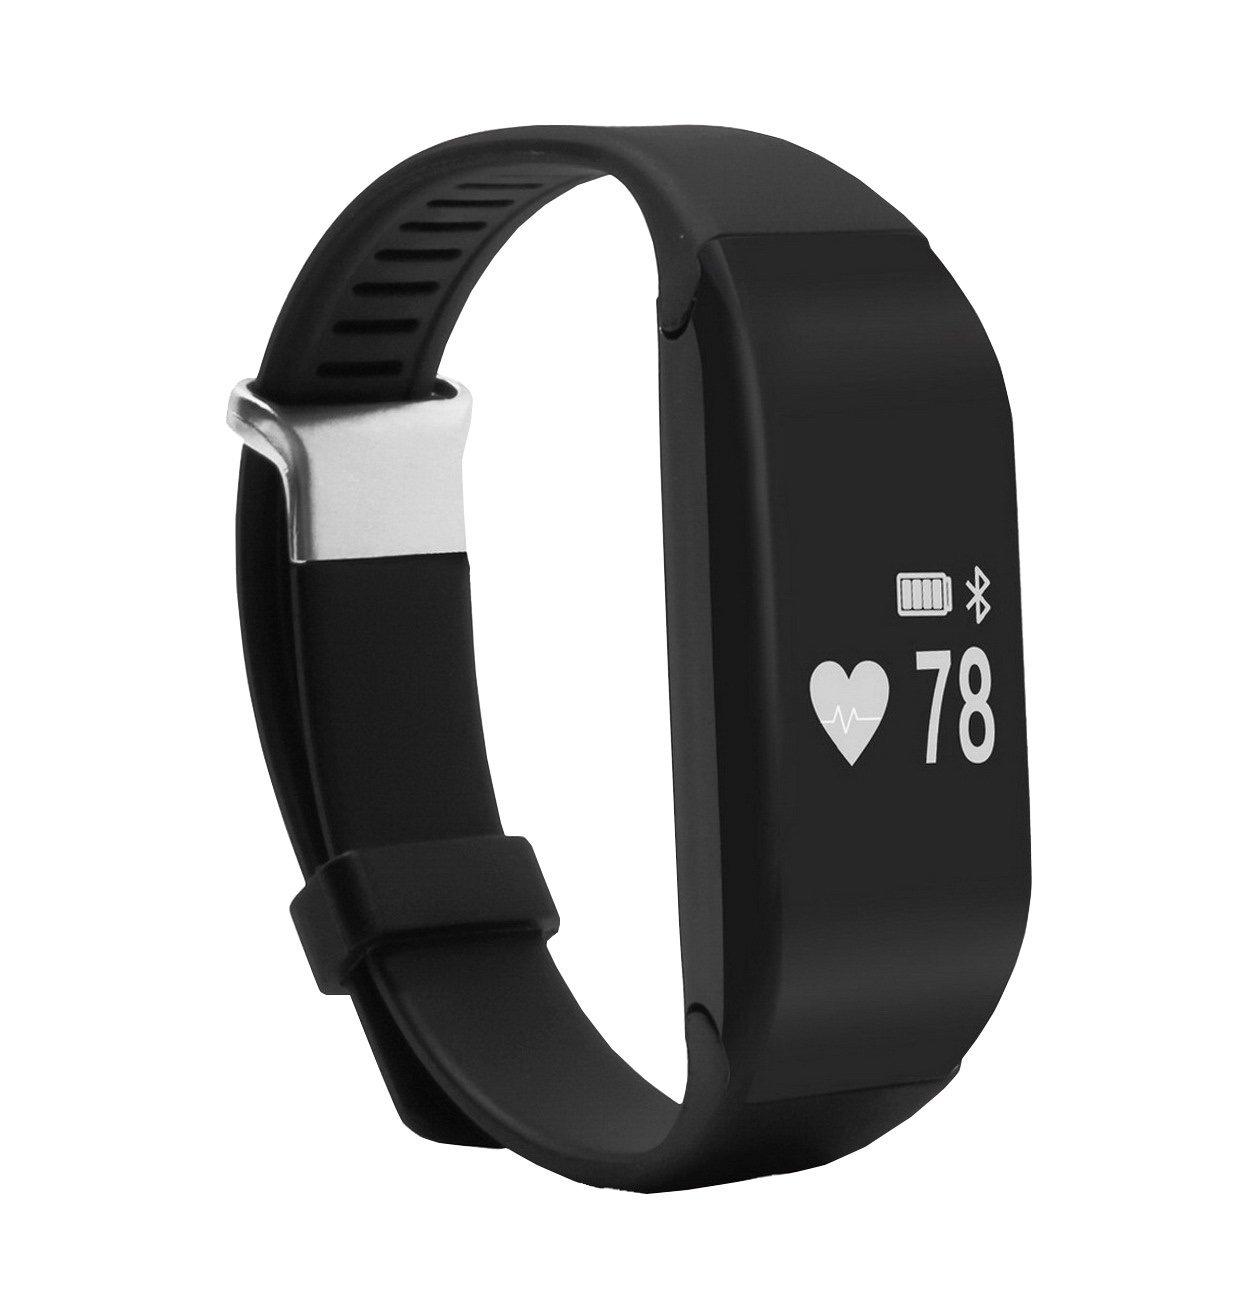 Bluetooth Waterproof Touch Screen Smart Watch Wristband Bracelet Pedometer Fitness Heart Rate Monitor